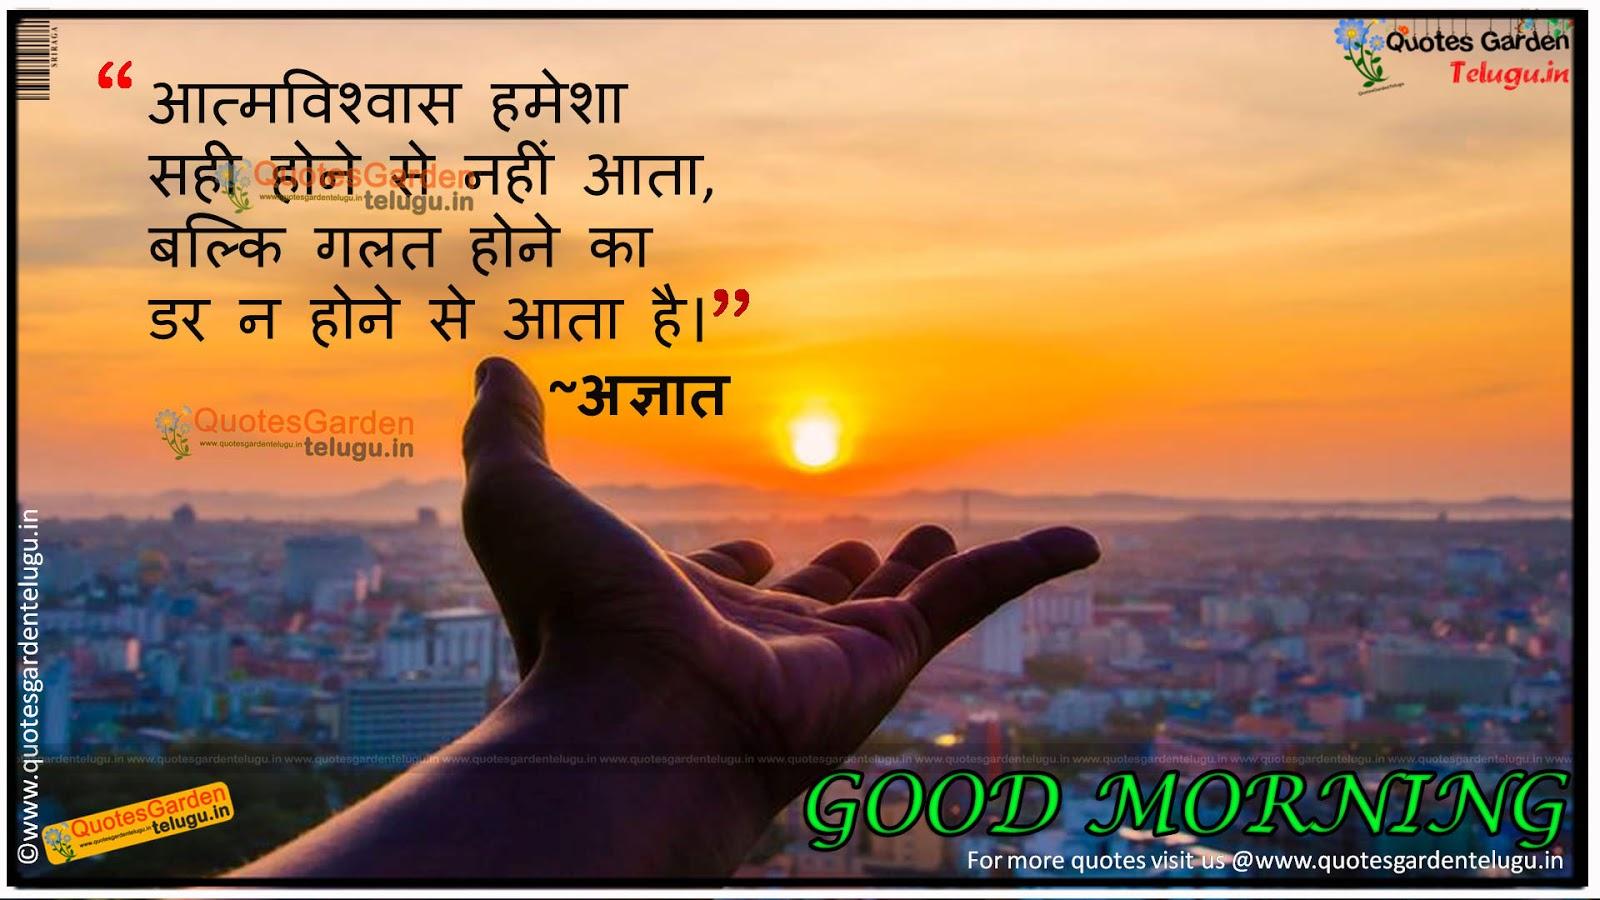 September 11 Quotes Inspirational Wallpapers Good Morning Shayari In Hindi 1219 Quotes Garden Telugu